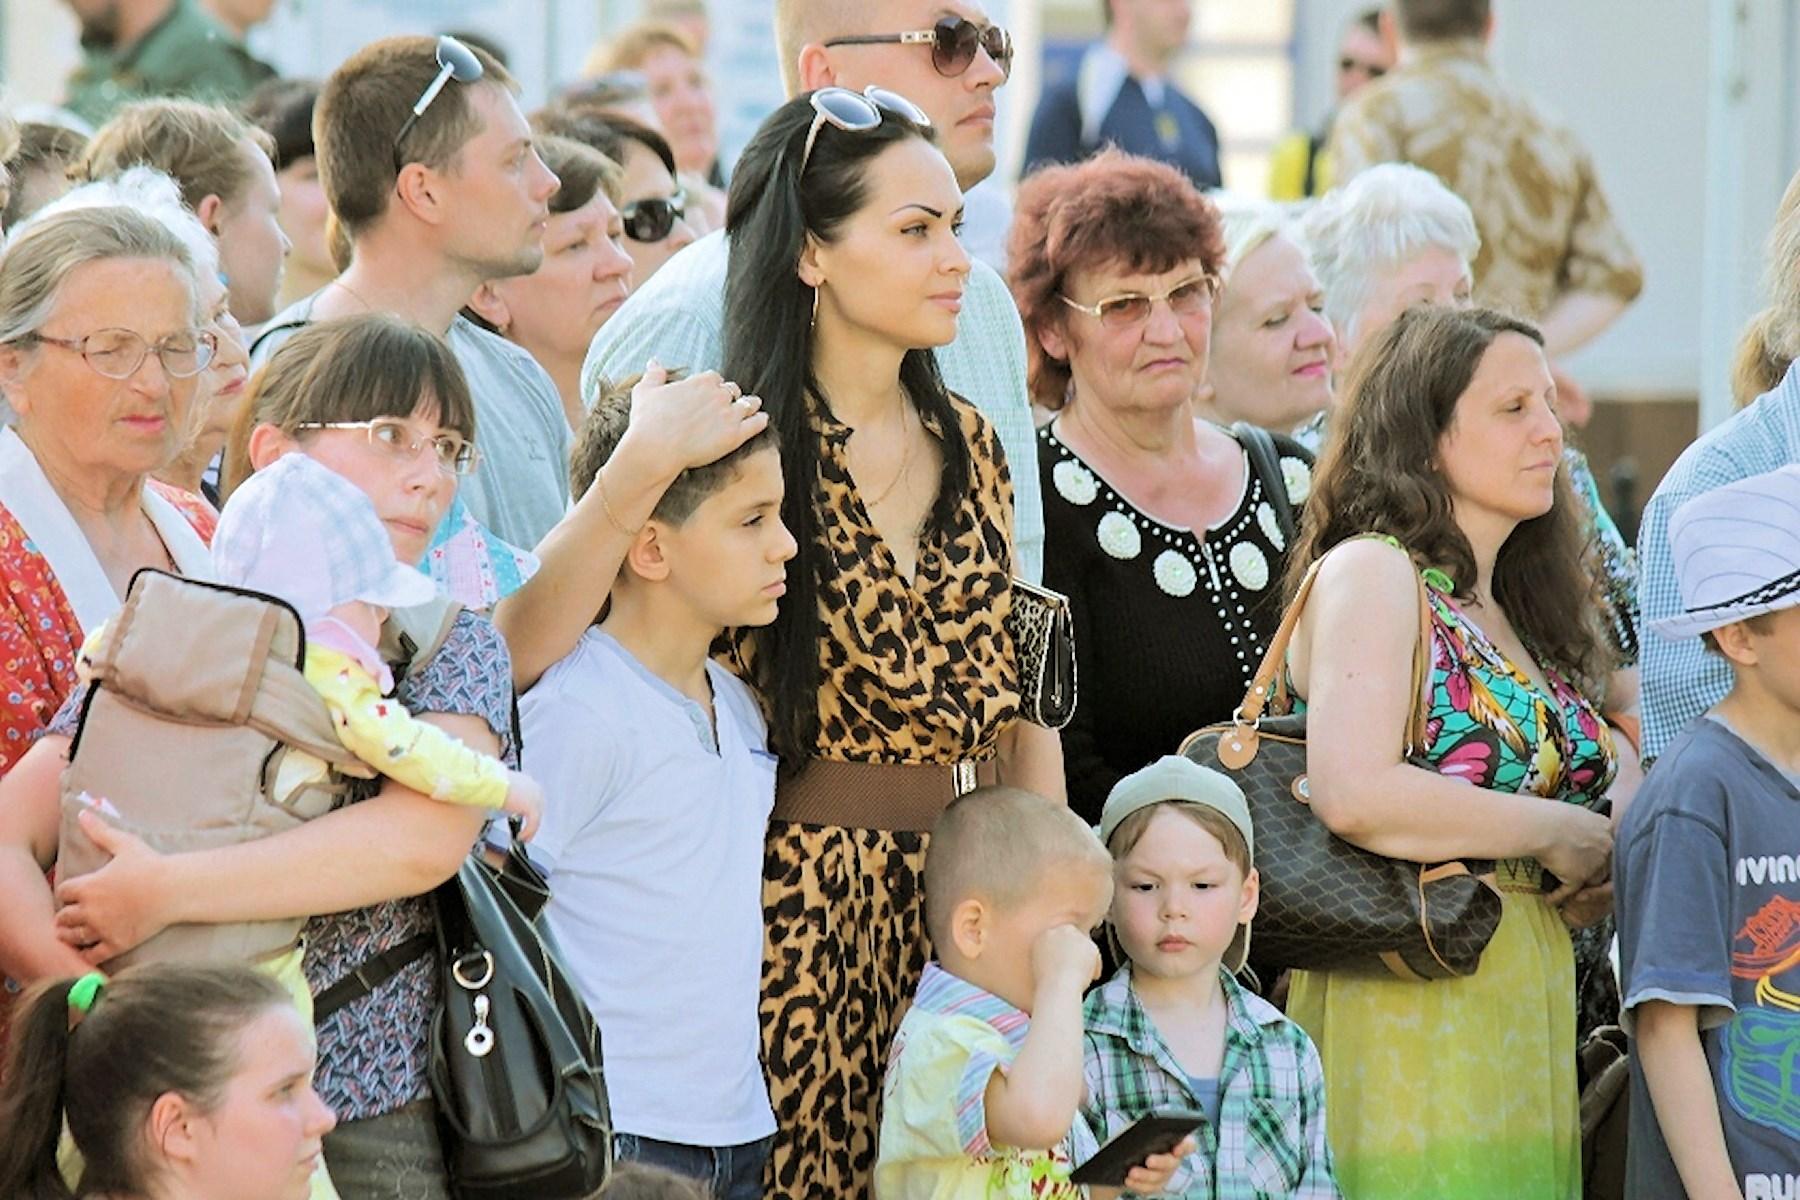 00 kobzon concert. lugansk. lnr. 01. 27.05.15